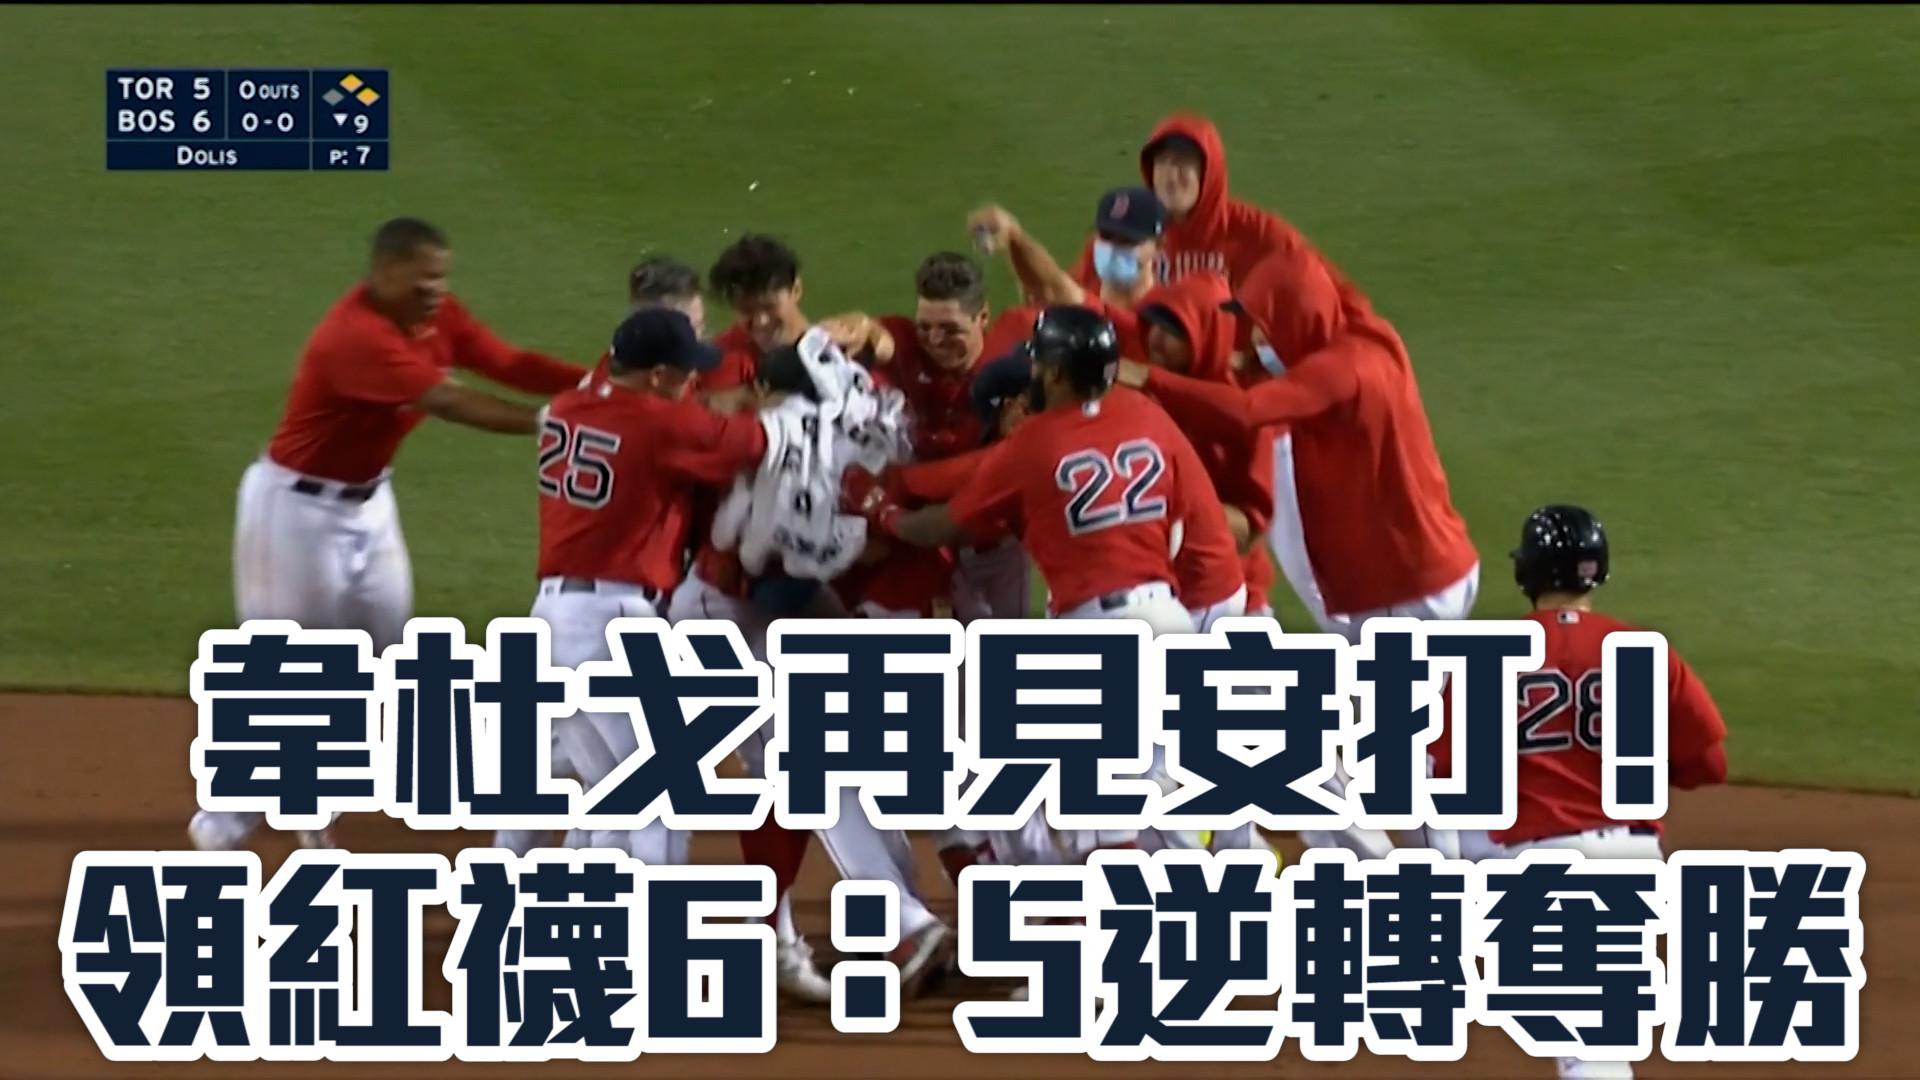 【MLB看愛爾達】韋杜戈再見安打!領紅襪6:5逆轉奪勝 06/12